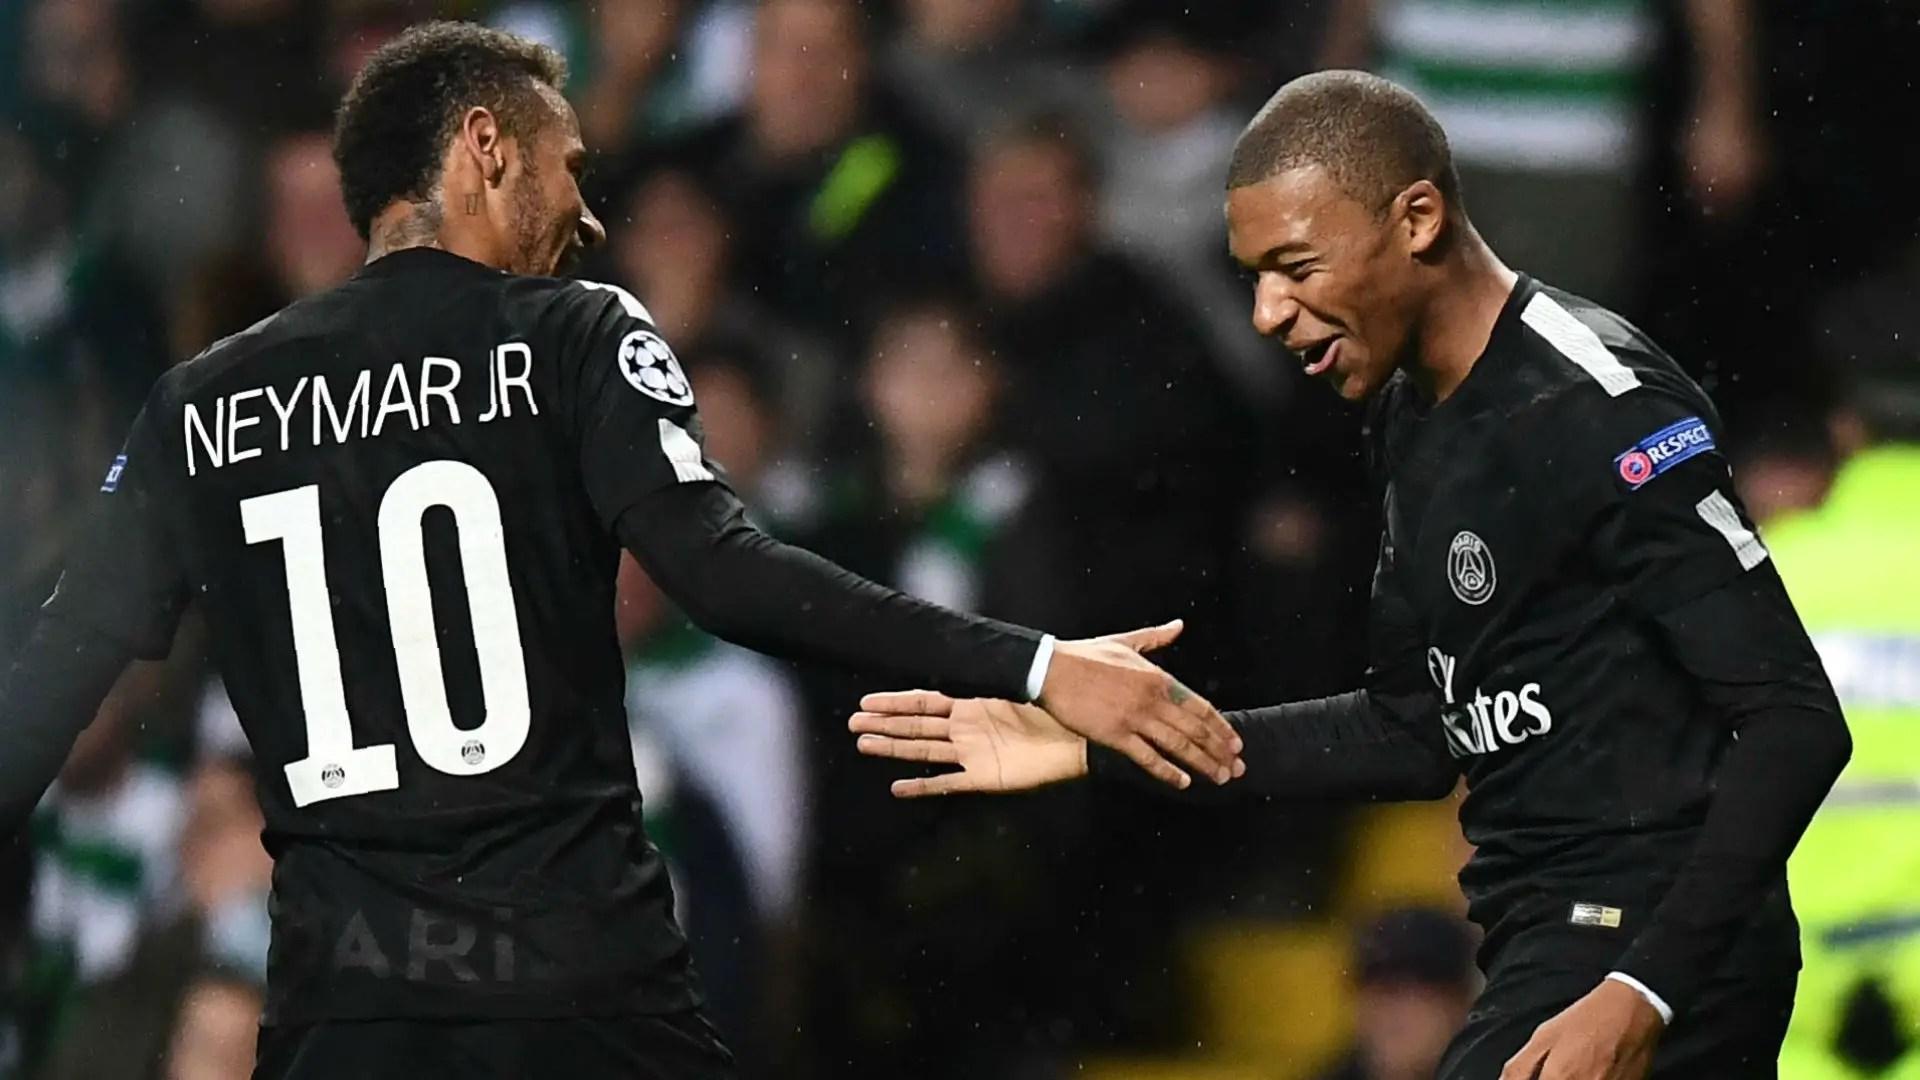 Neymar Talks Up Mbappe PSG Partnership, Insists French Striker Can Still Get Better